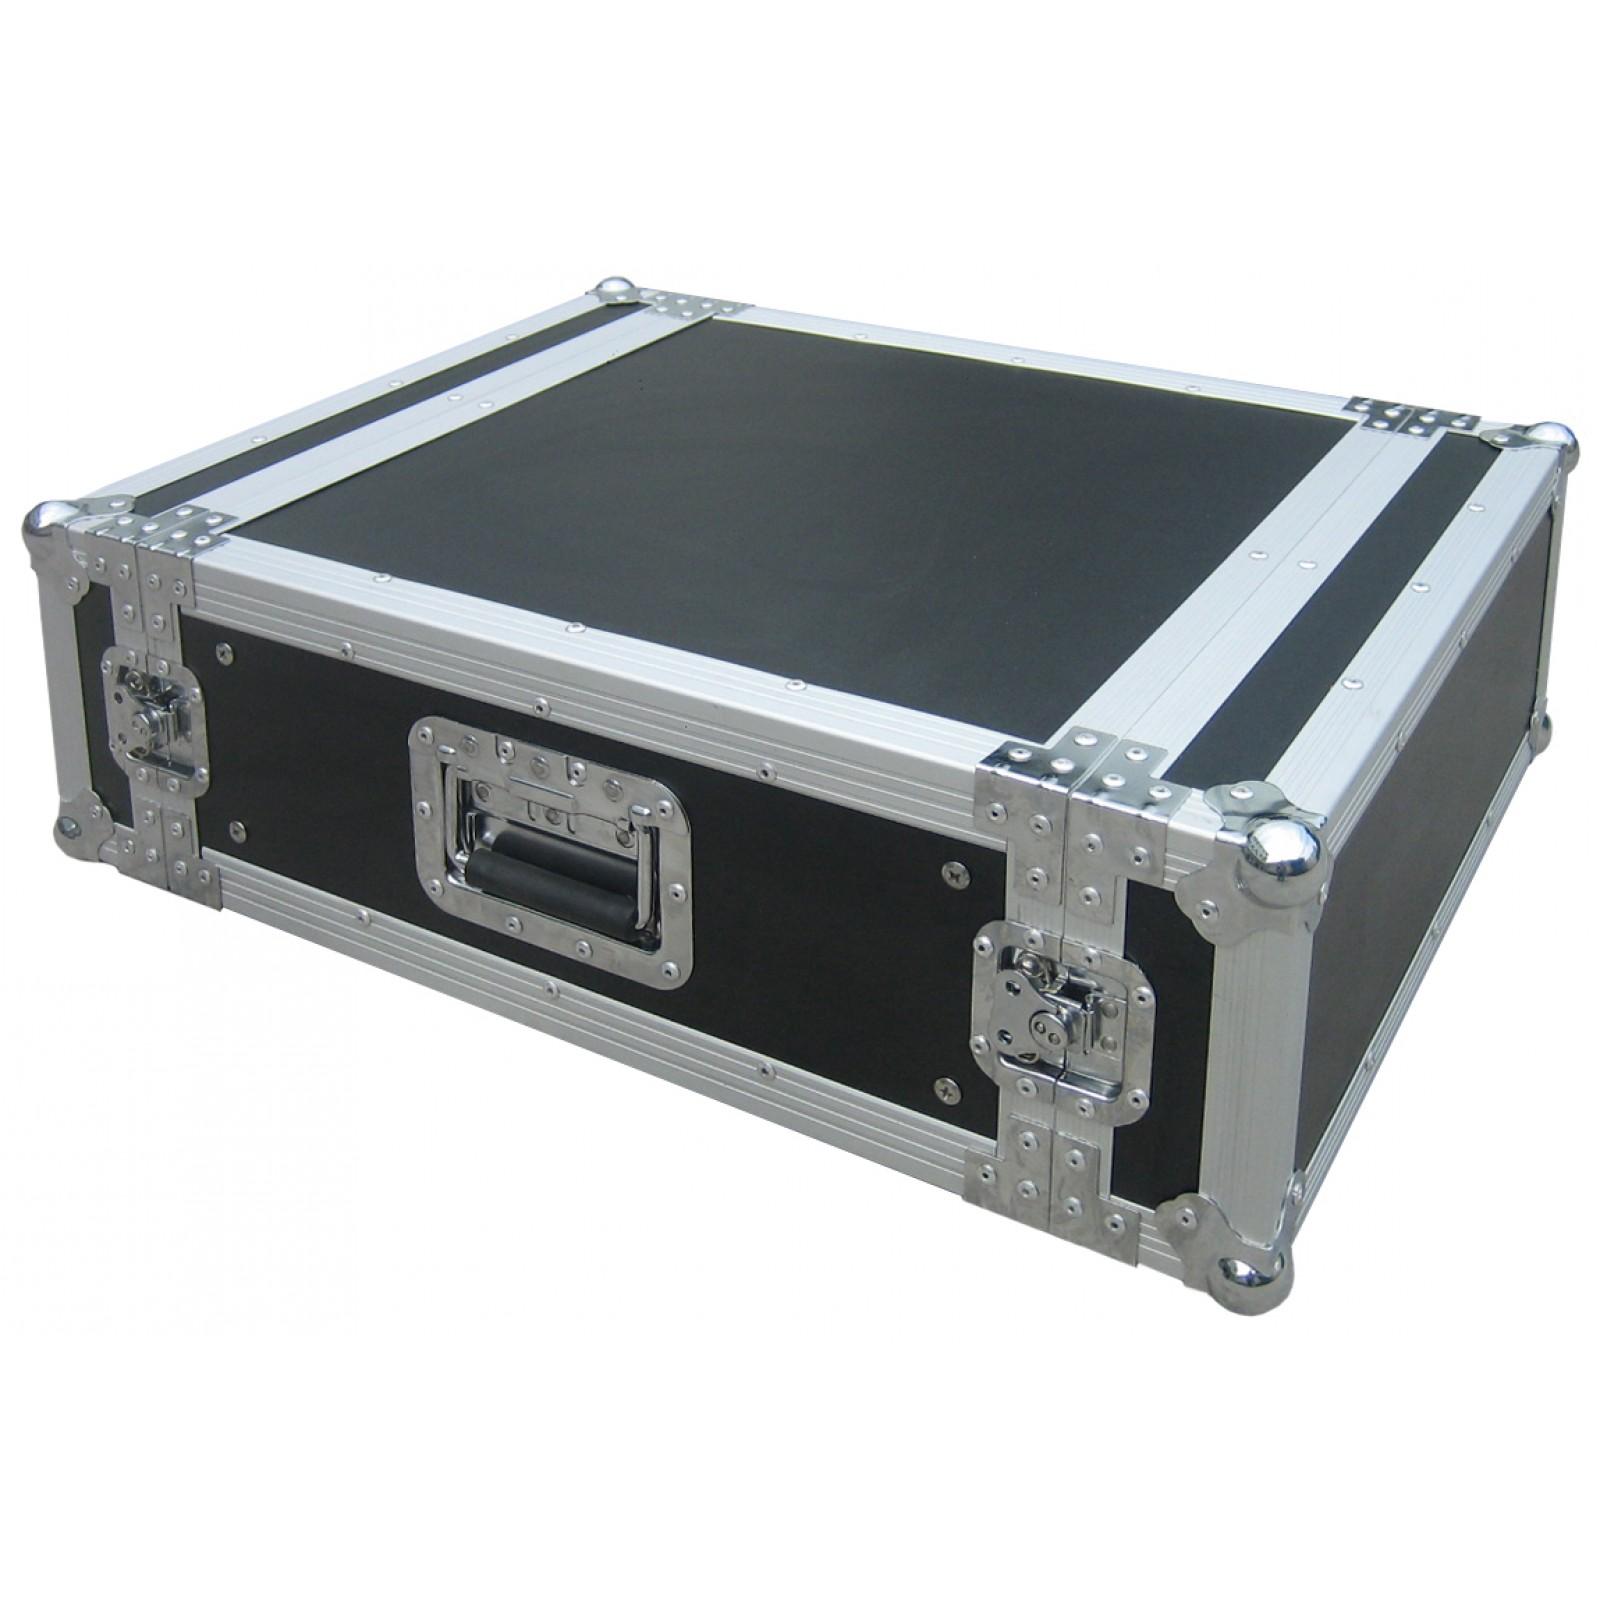 RACK CASE 4U - Flightcases